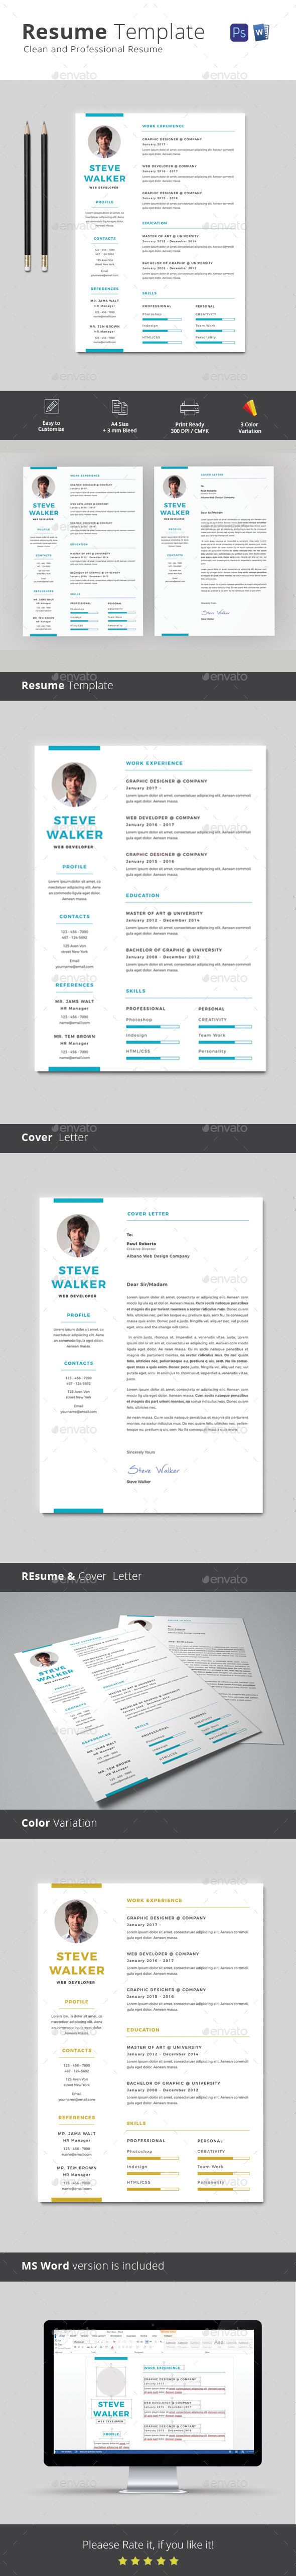 CV / Resume #indesign resume #trendy cv  • Download here → https://graphicriver.net/item/cv-resume/20737020?ref=pxcr